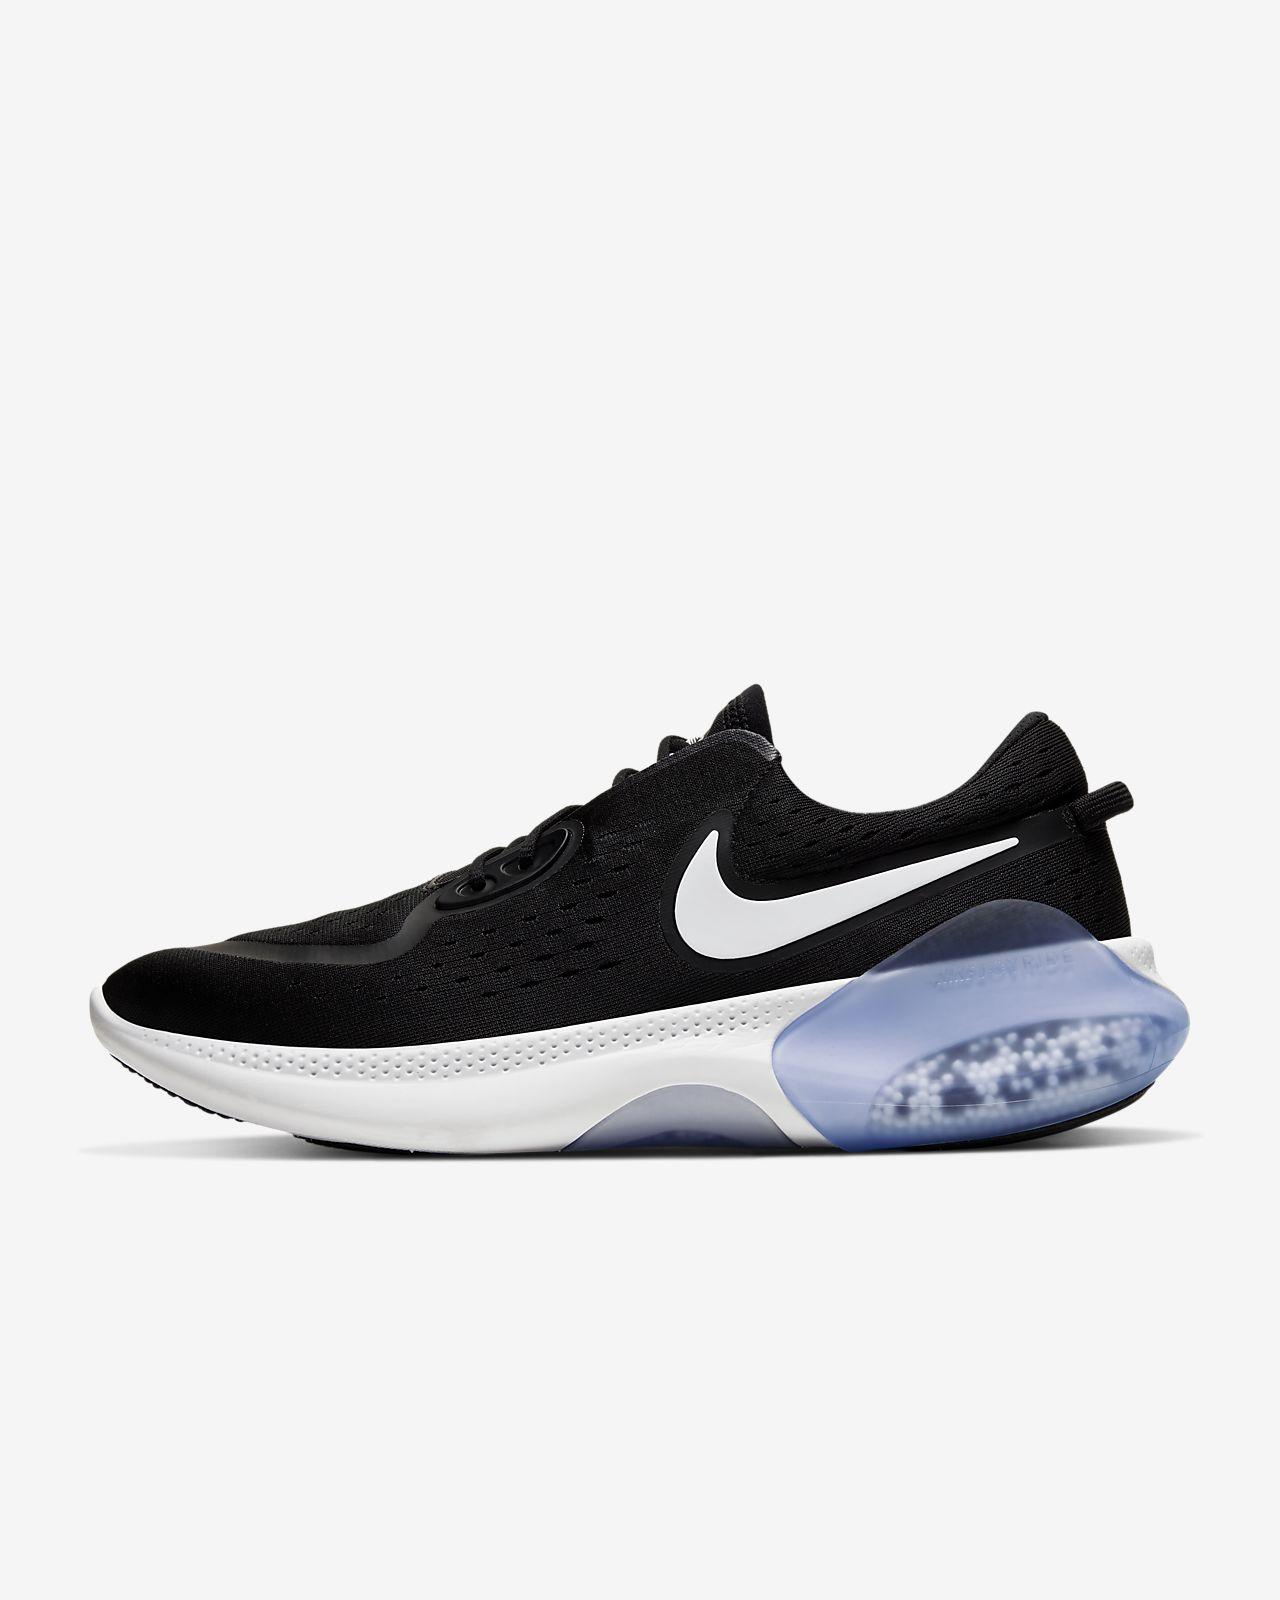 Sapatilhas de running Nike Joyride Dual Run para homem